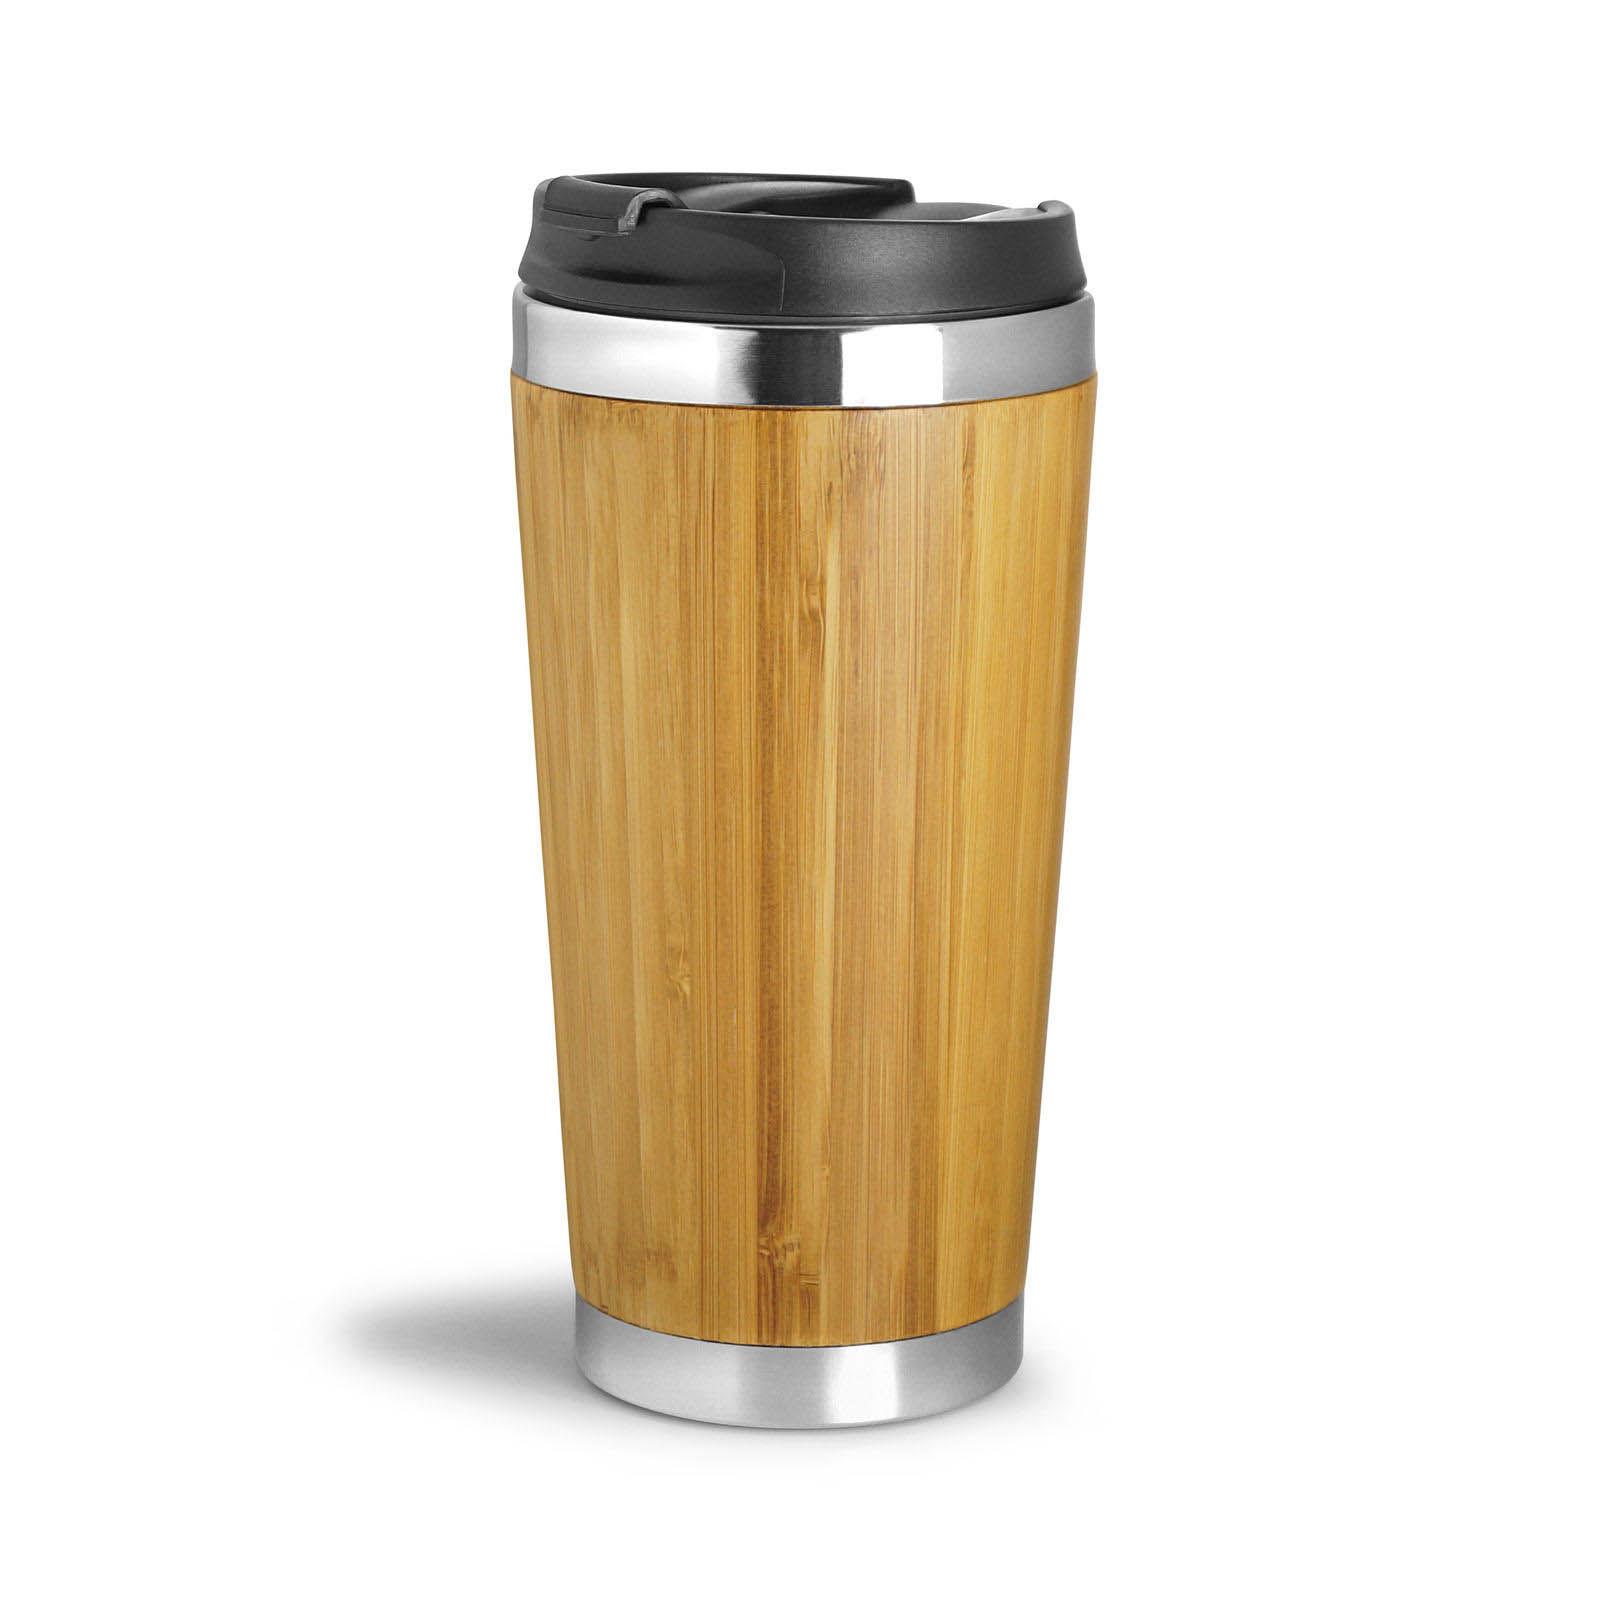 PublicitaireWood Mugs Mug You PublicitaireWood Personnalisés Mug You n0mN8w